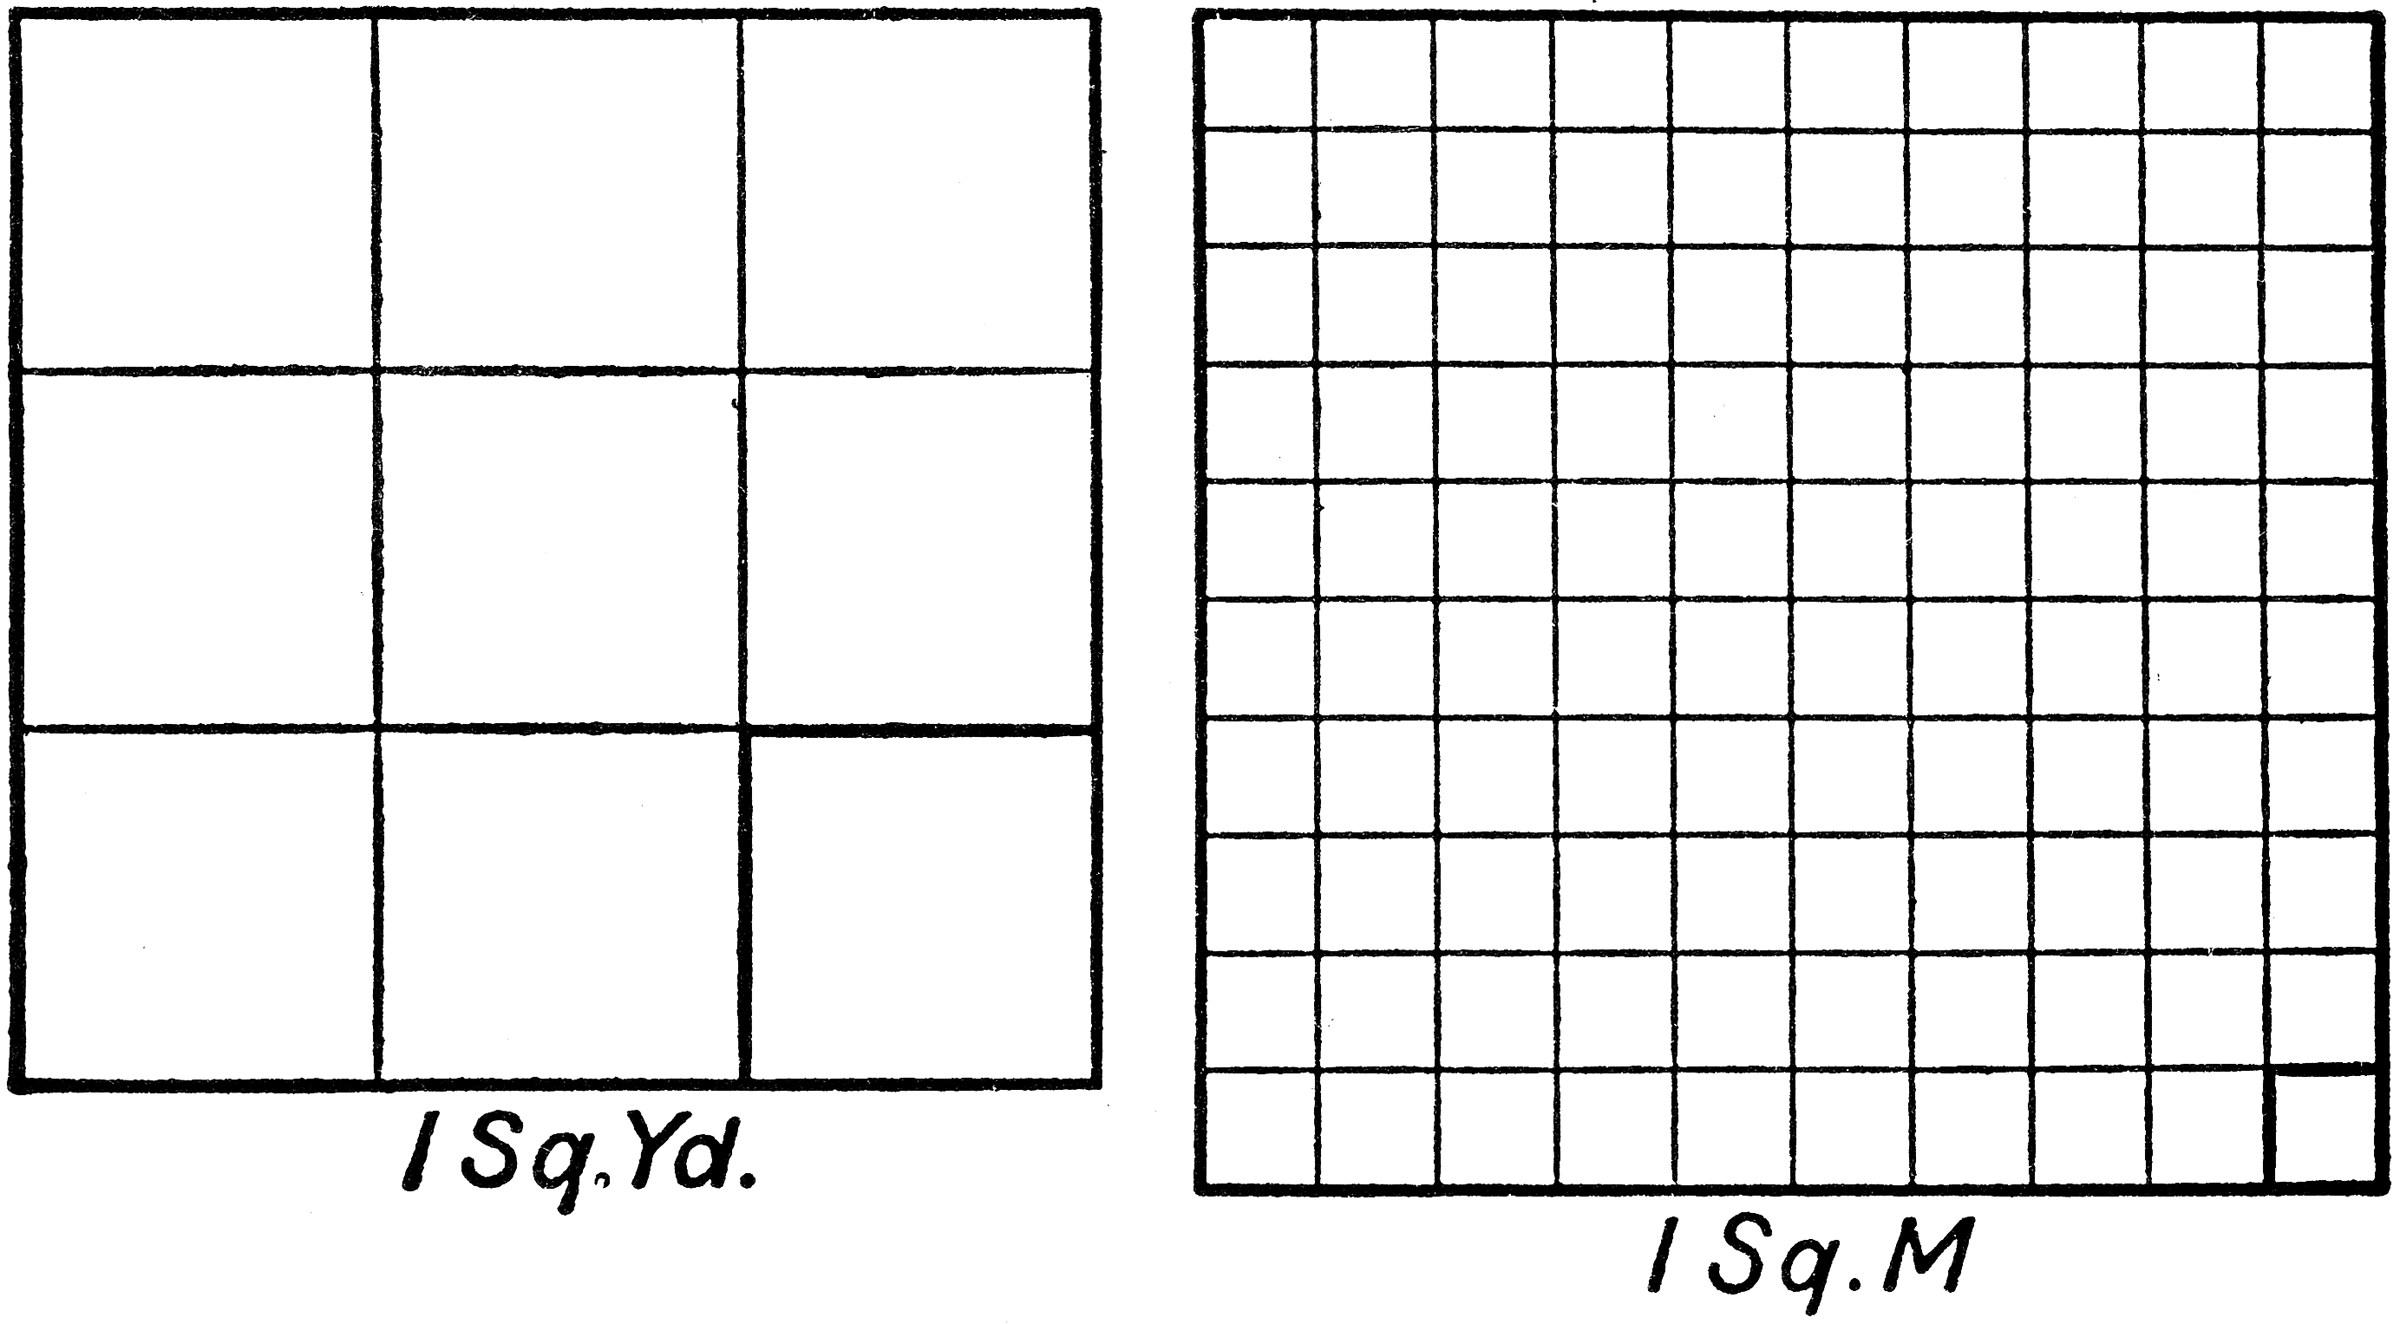 Comparison Of Units Of Square Measure ClipArt ETC